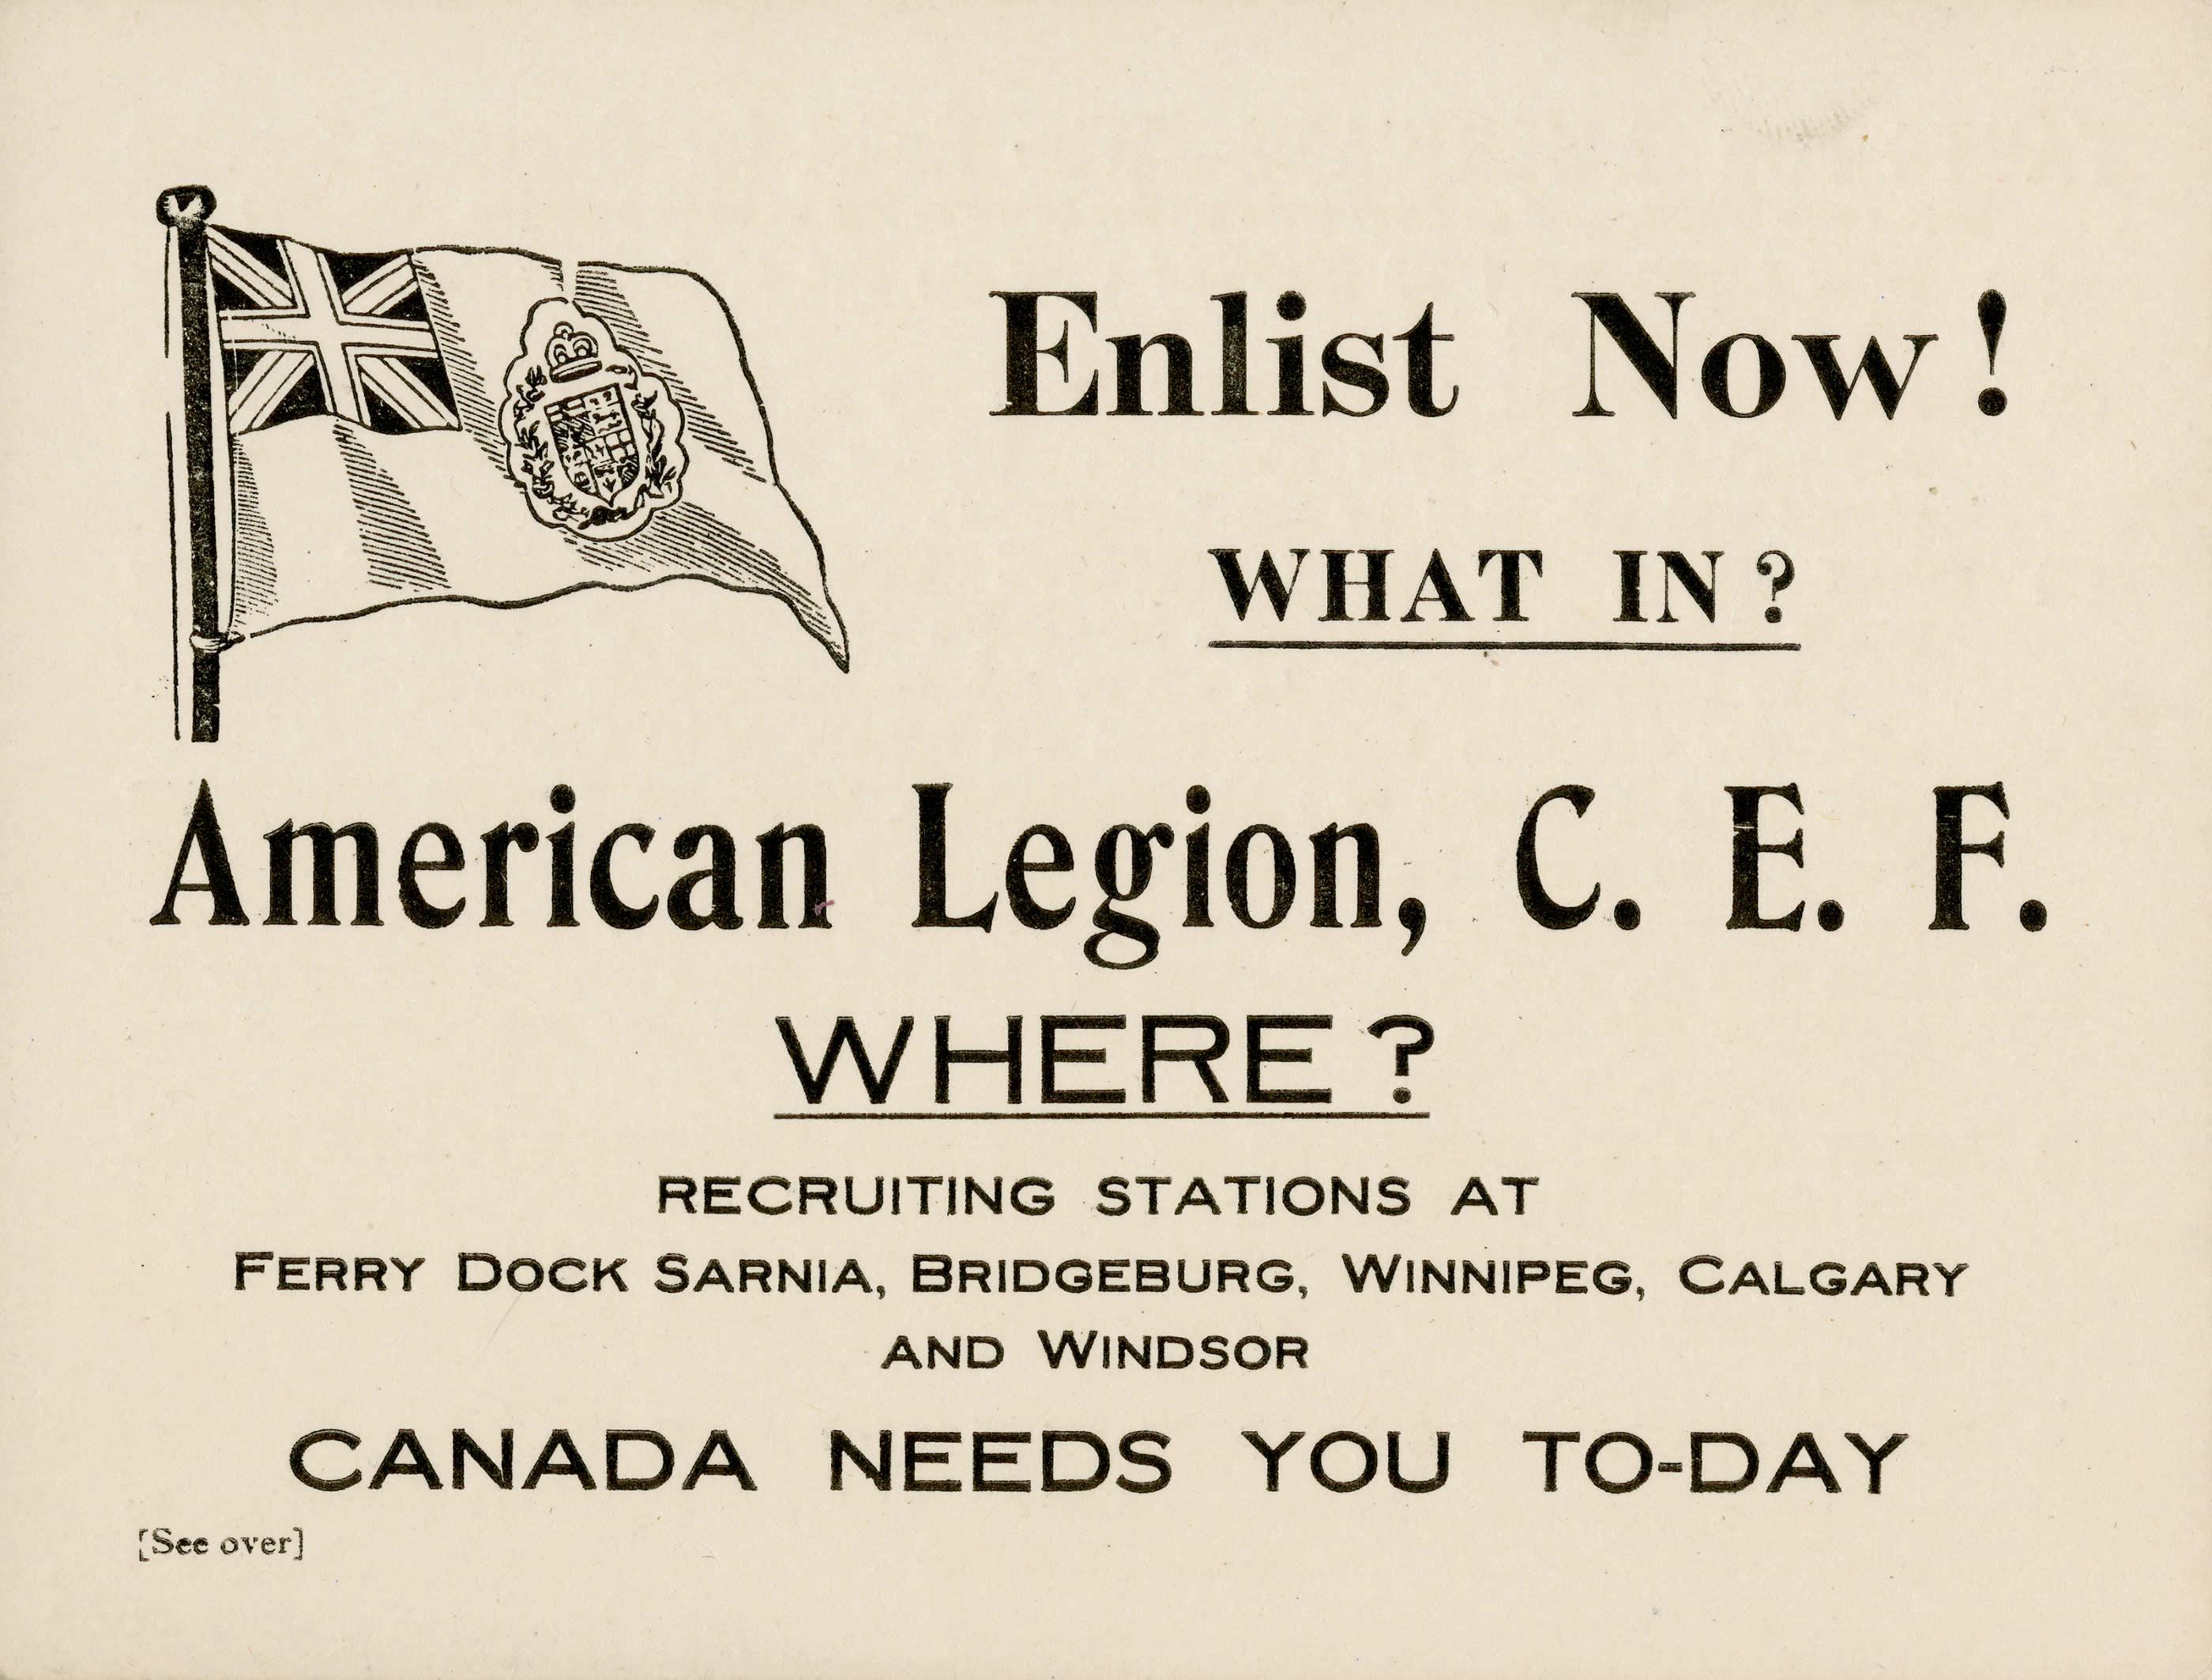 <i>Enlist Now!</i>